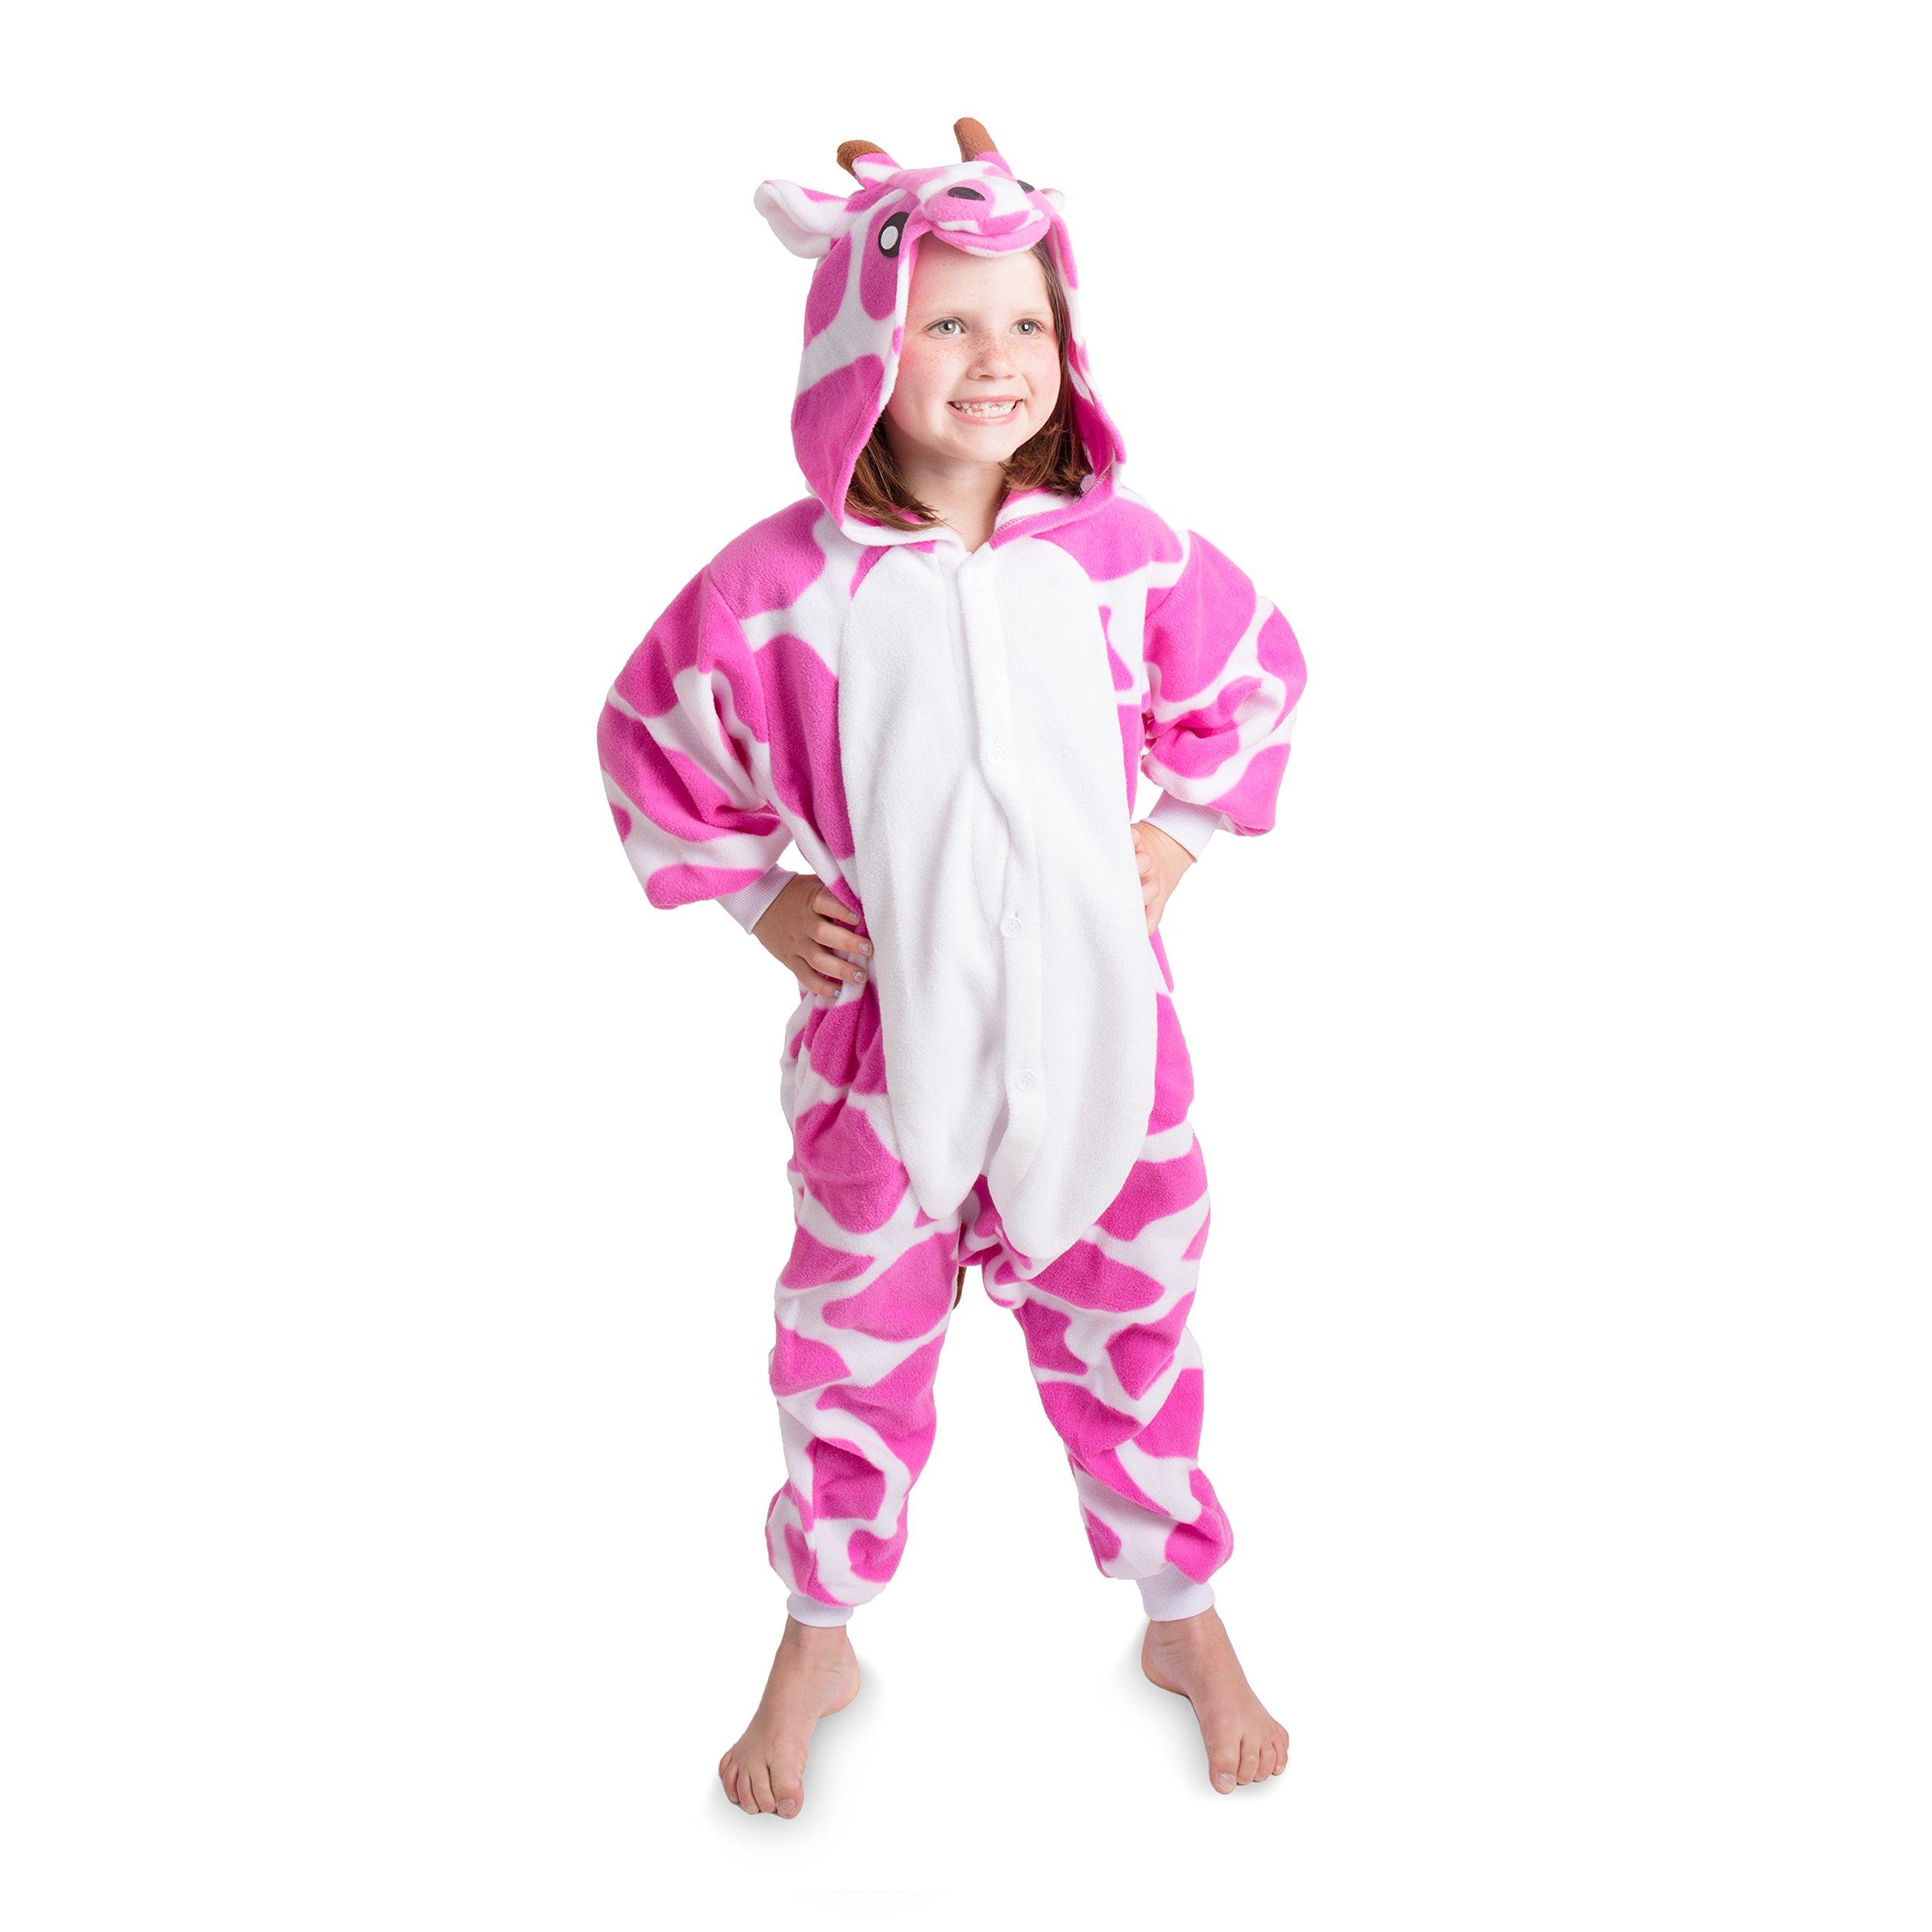 3426ecd029 Emolly Fashion Kids Animal Giraffe Pajama Onesie - Soft and Comfortable  with Pockets